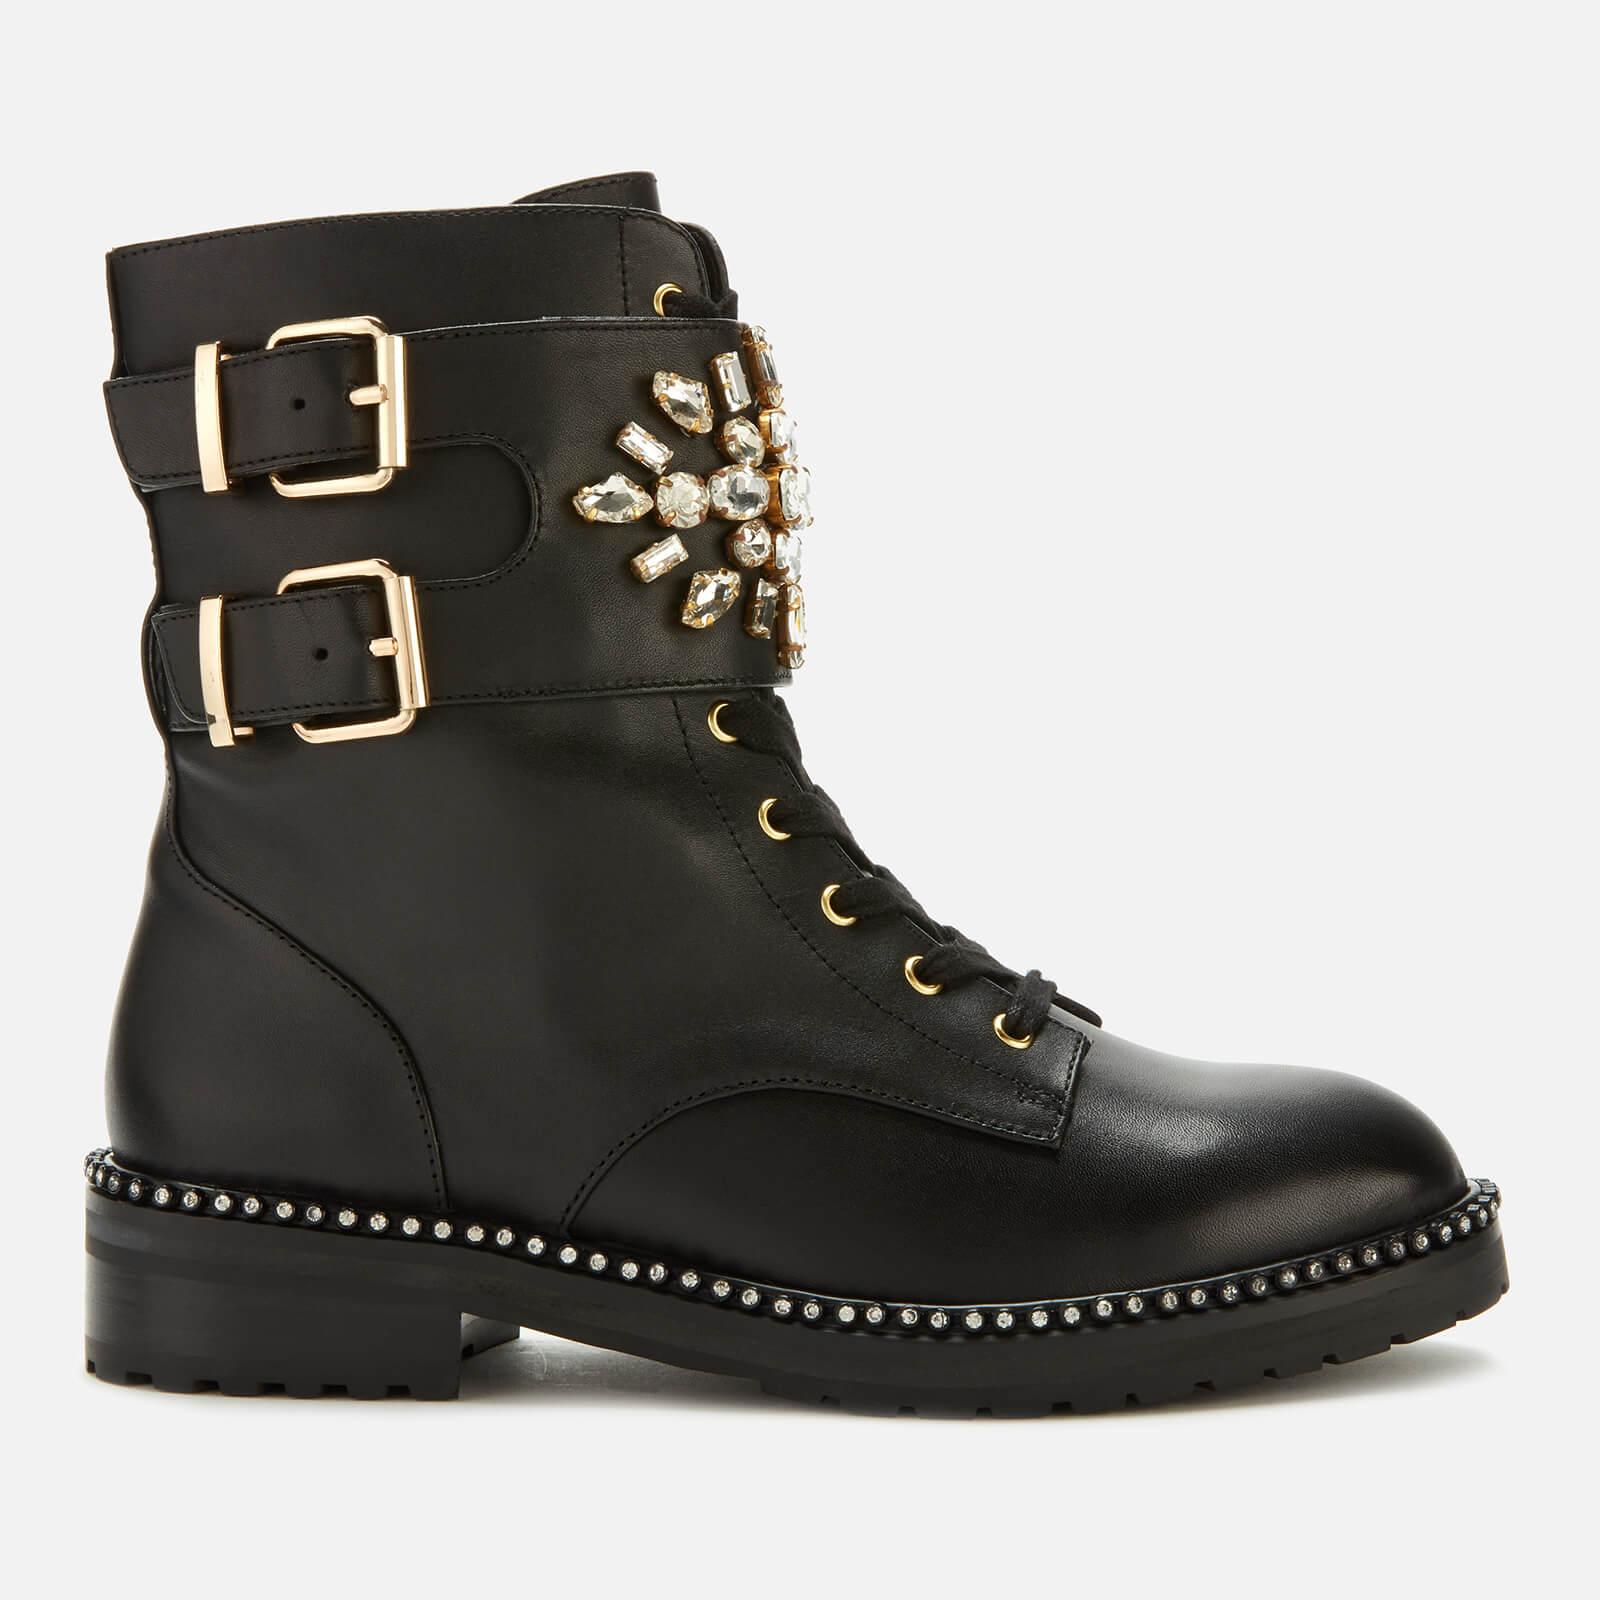 Kurt Geiger London Women's Stoop Leather Lace Up Boots - Black - UK 6